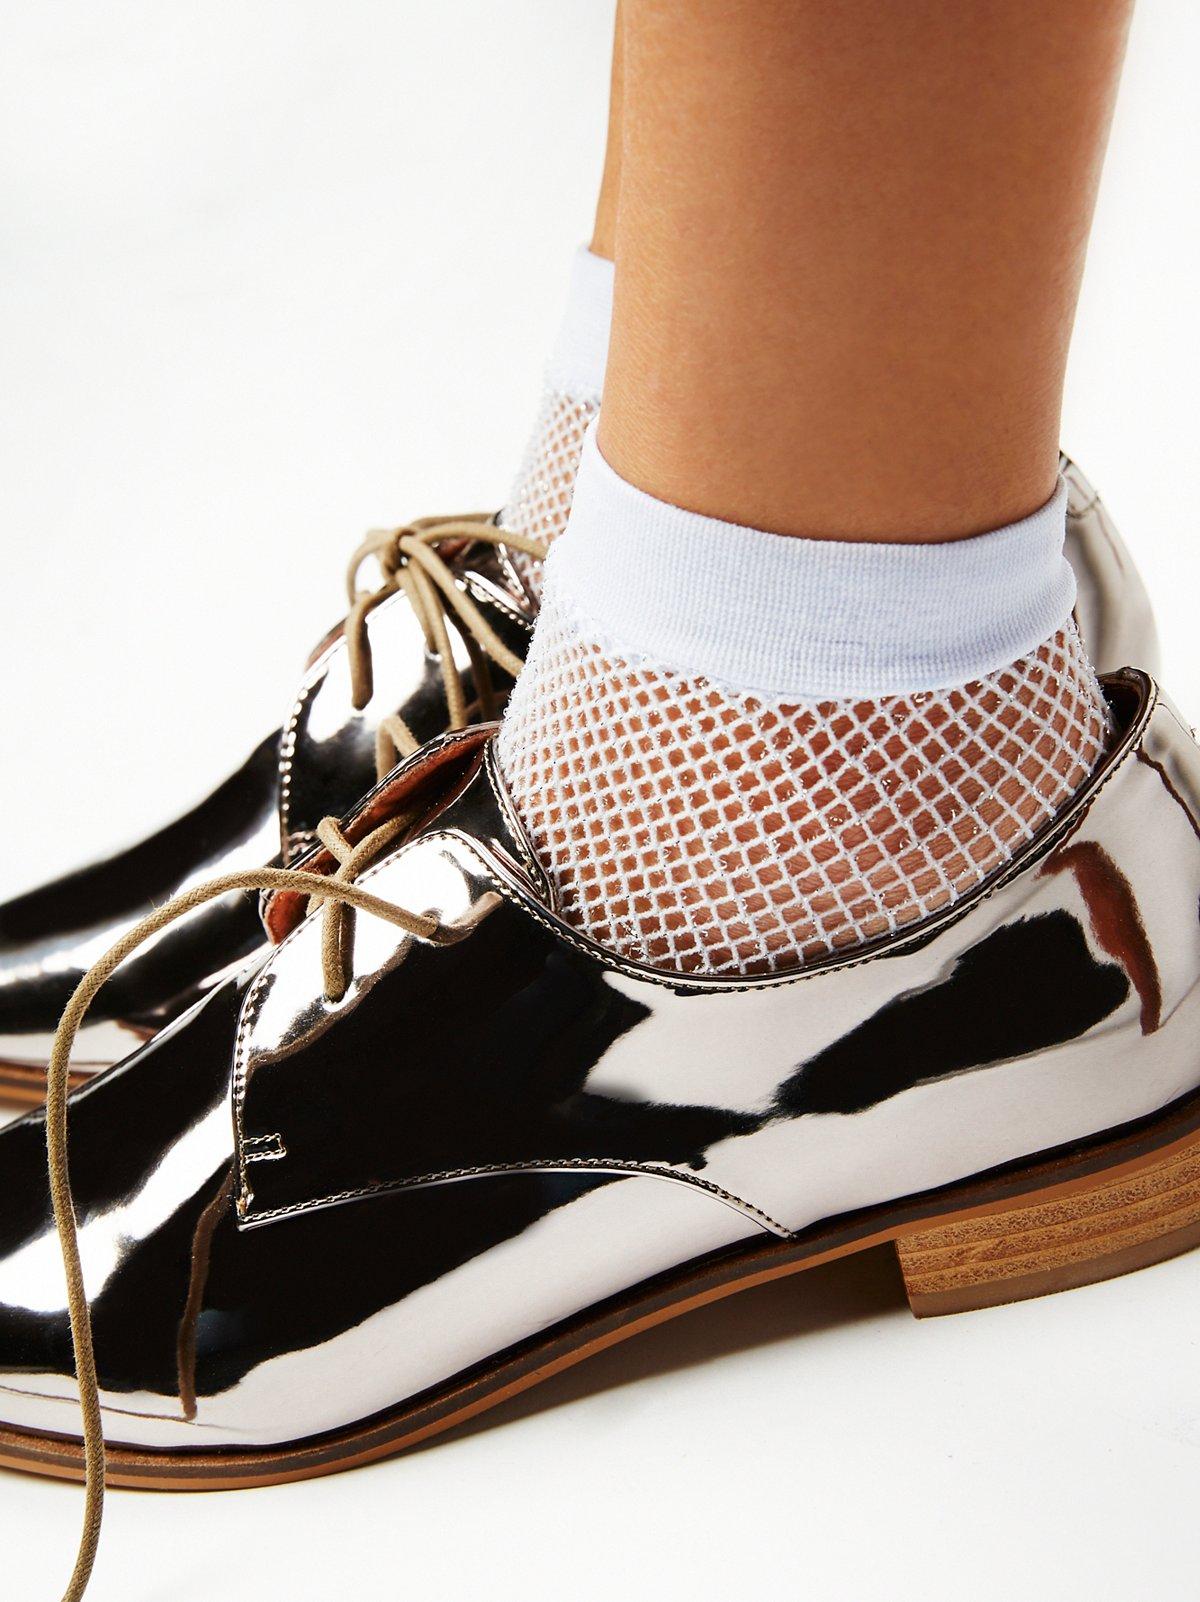 Heartbreaker Net Anklet